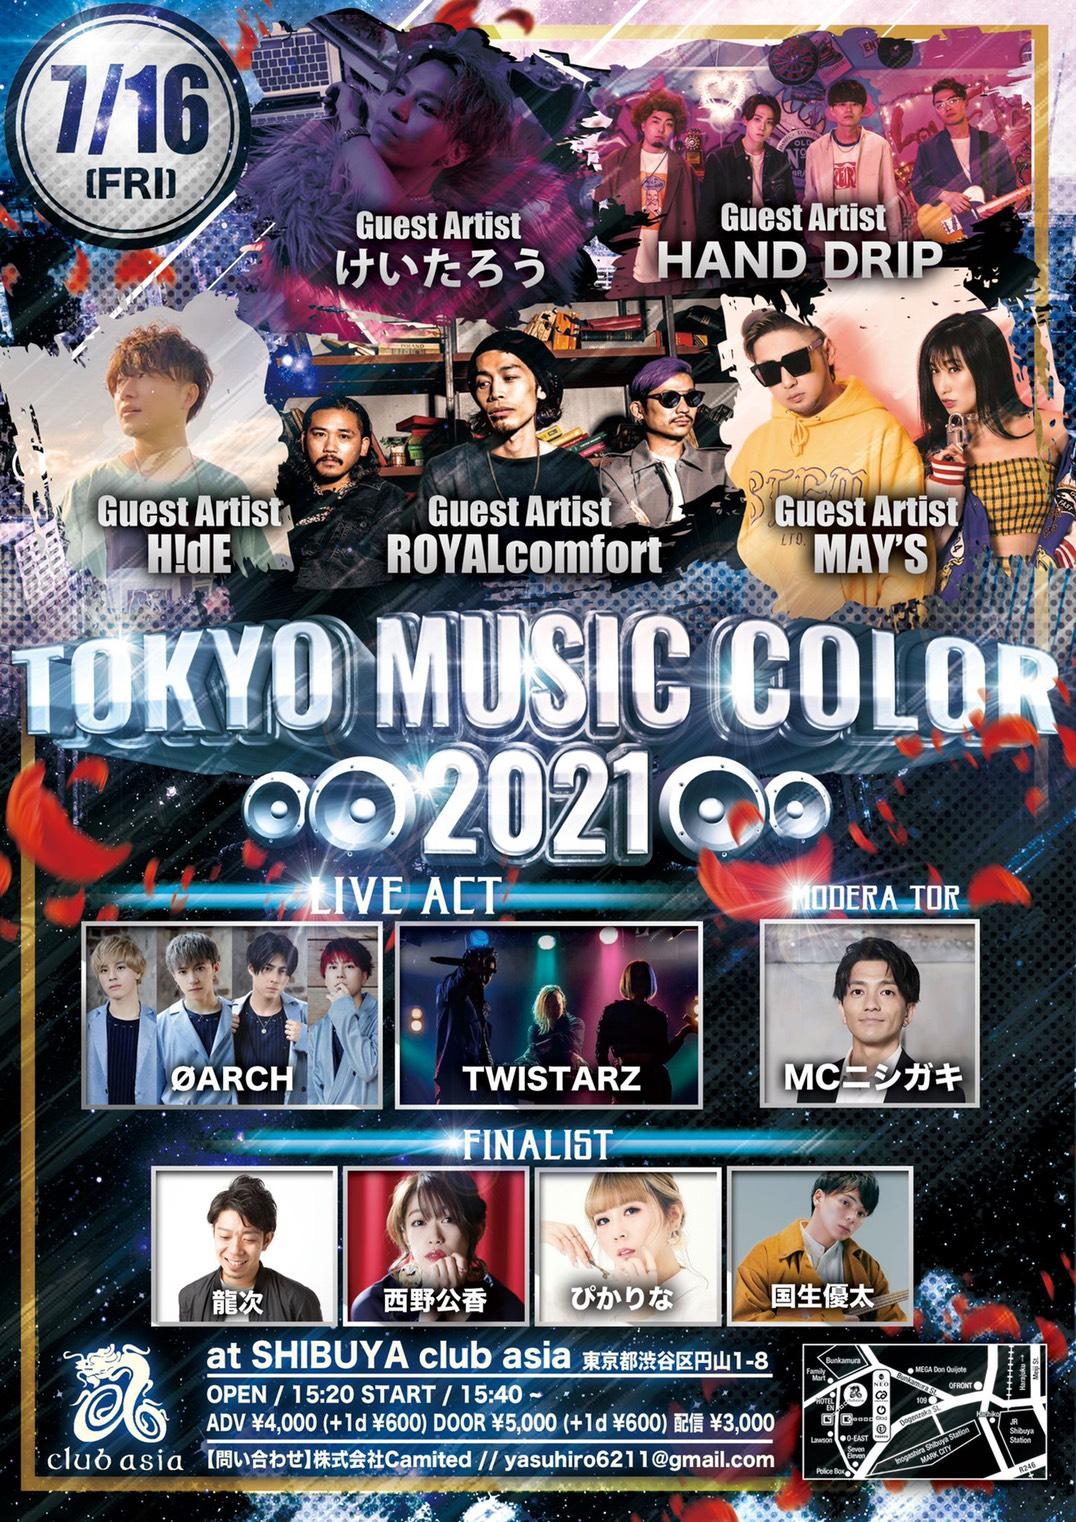 TOKYO MUSIC COLOR 2021